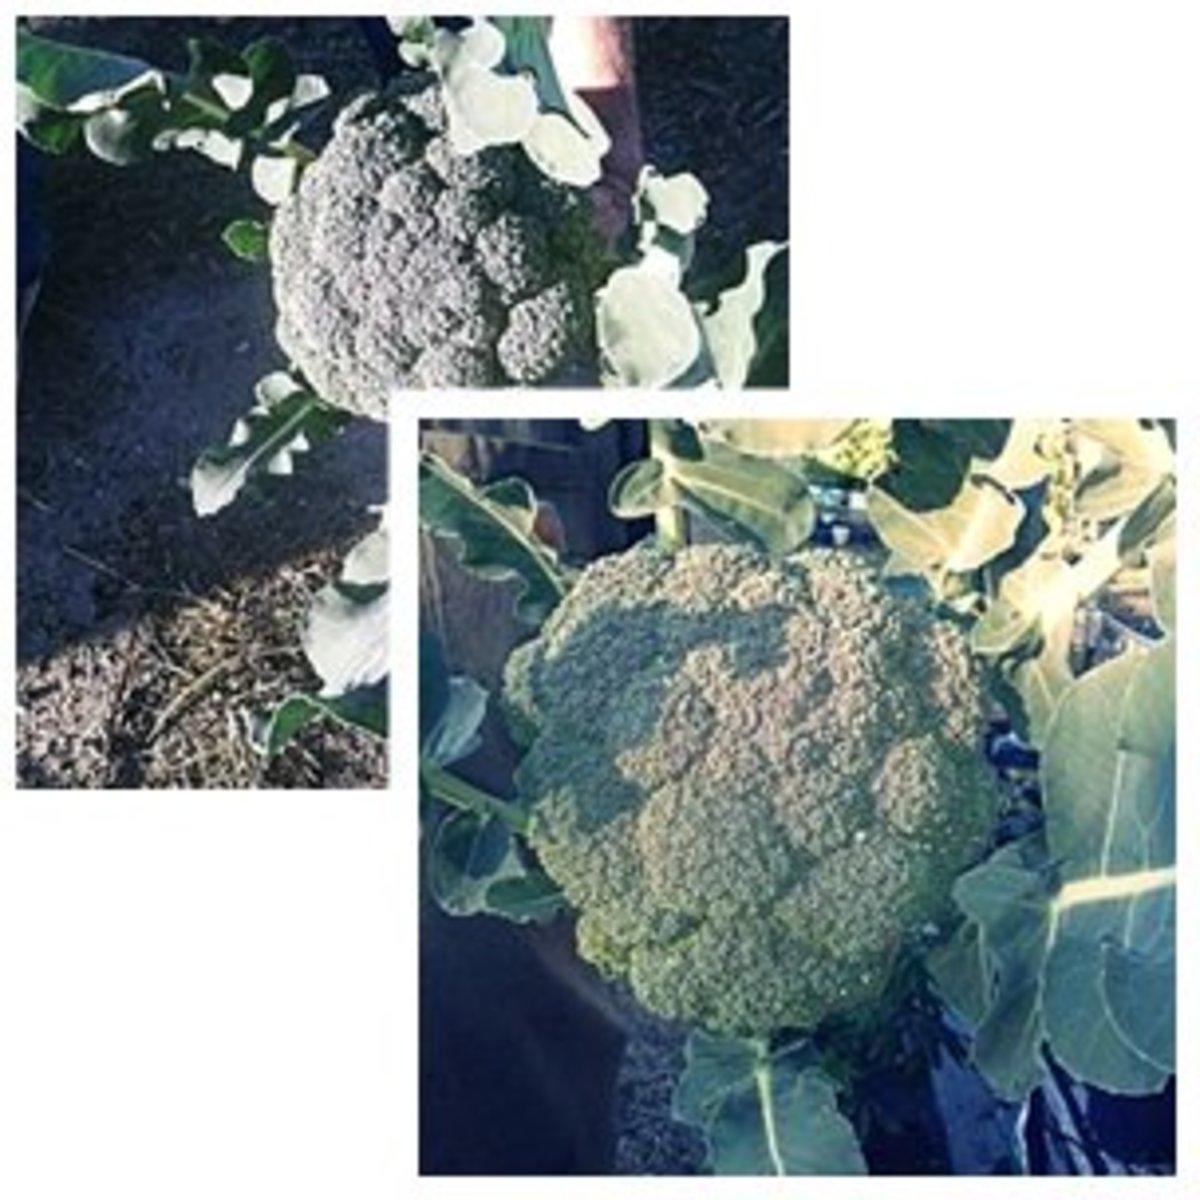 Fresh broccoli from the garden.